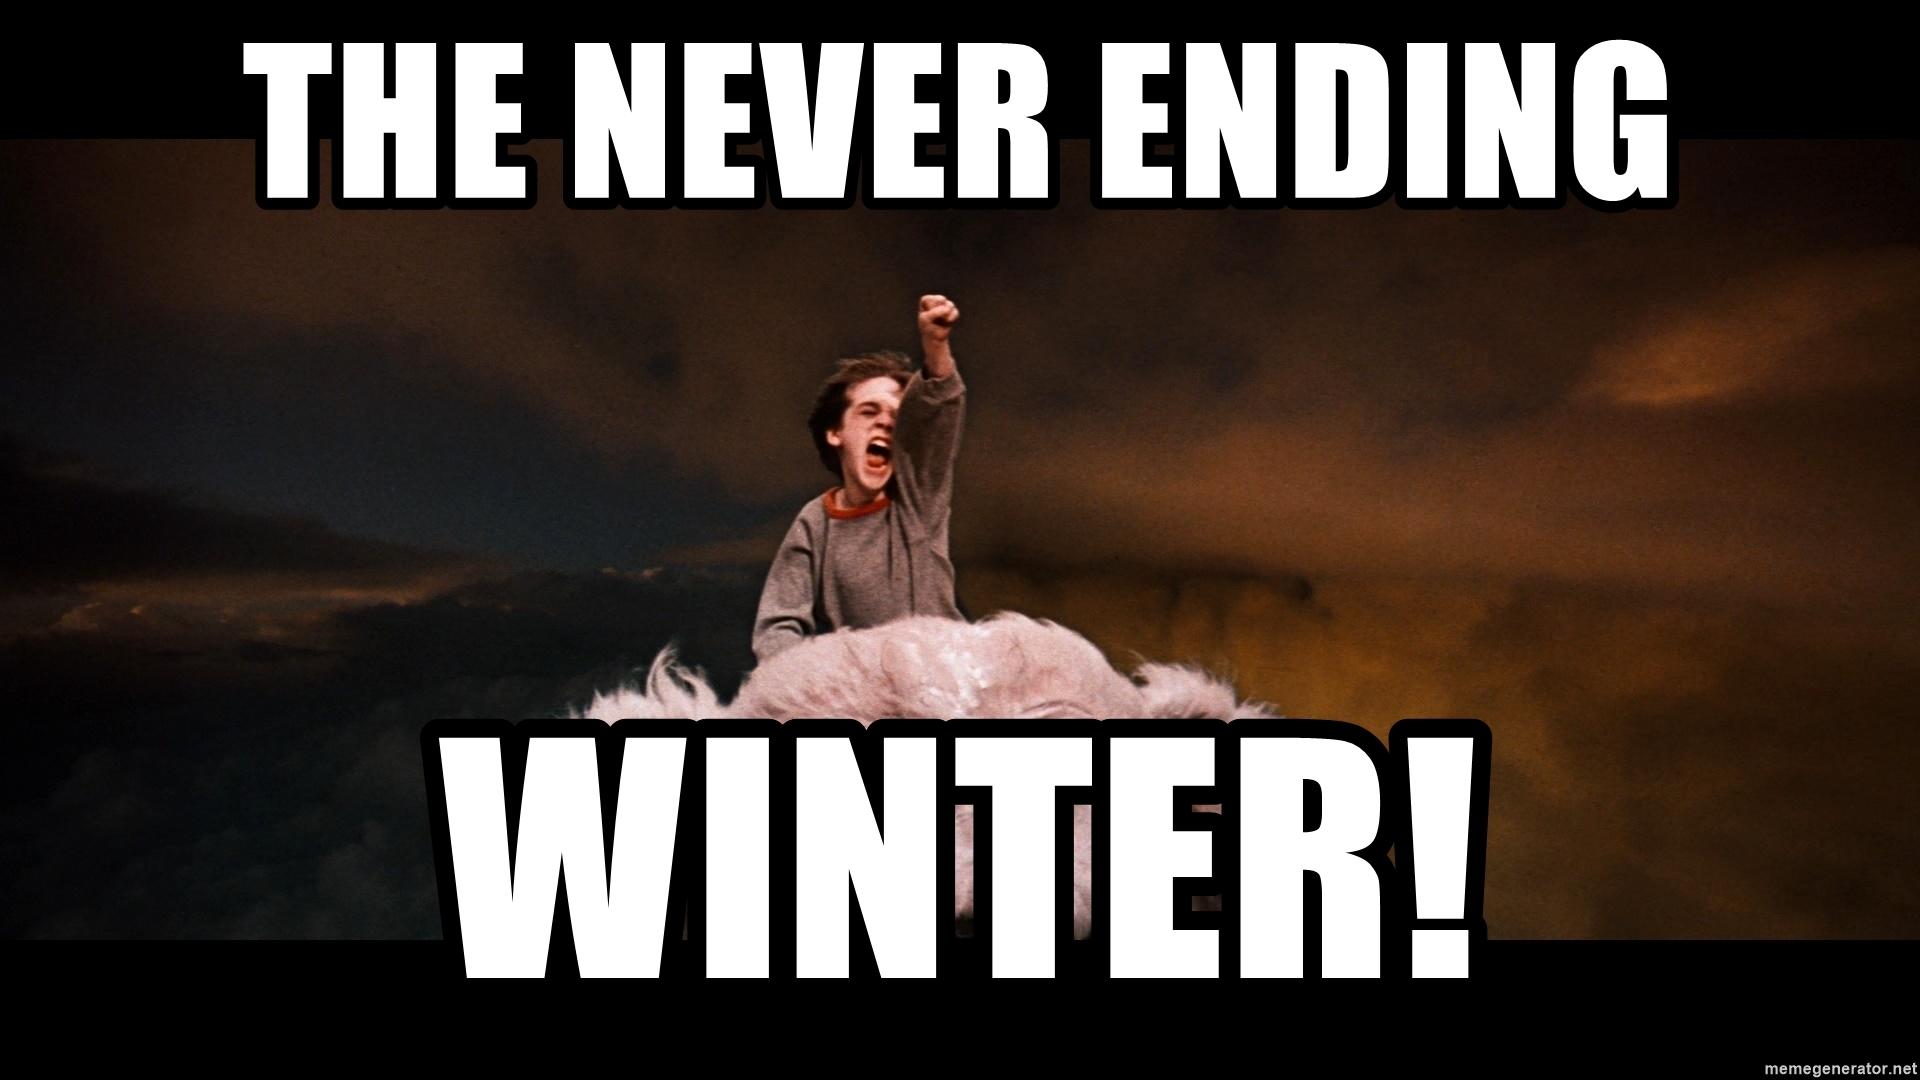 the-never-ending-winterペクチョン天皇の呪いでネバーエンディングウインター